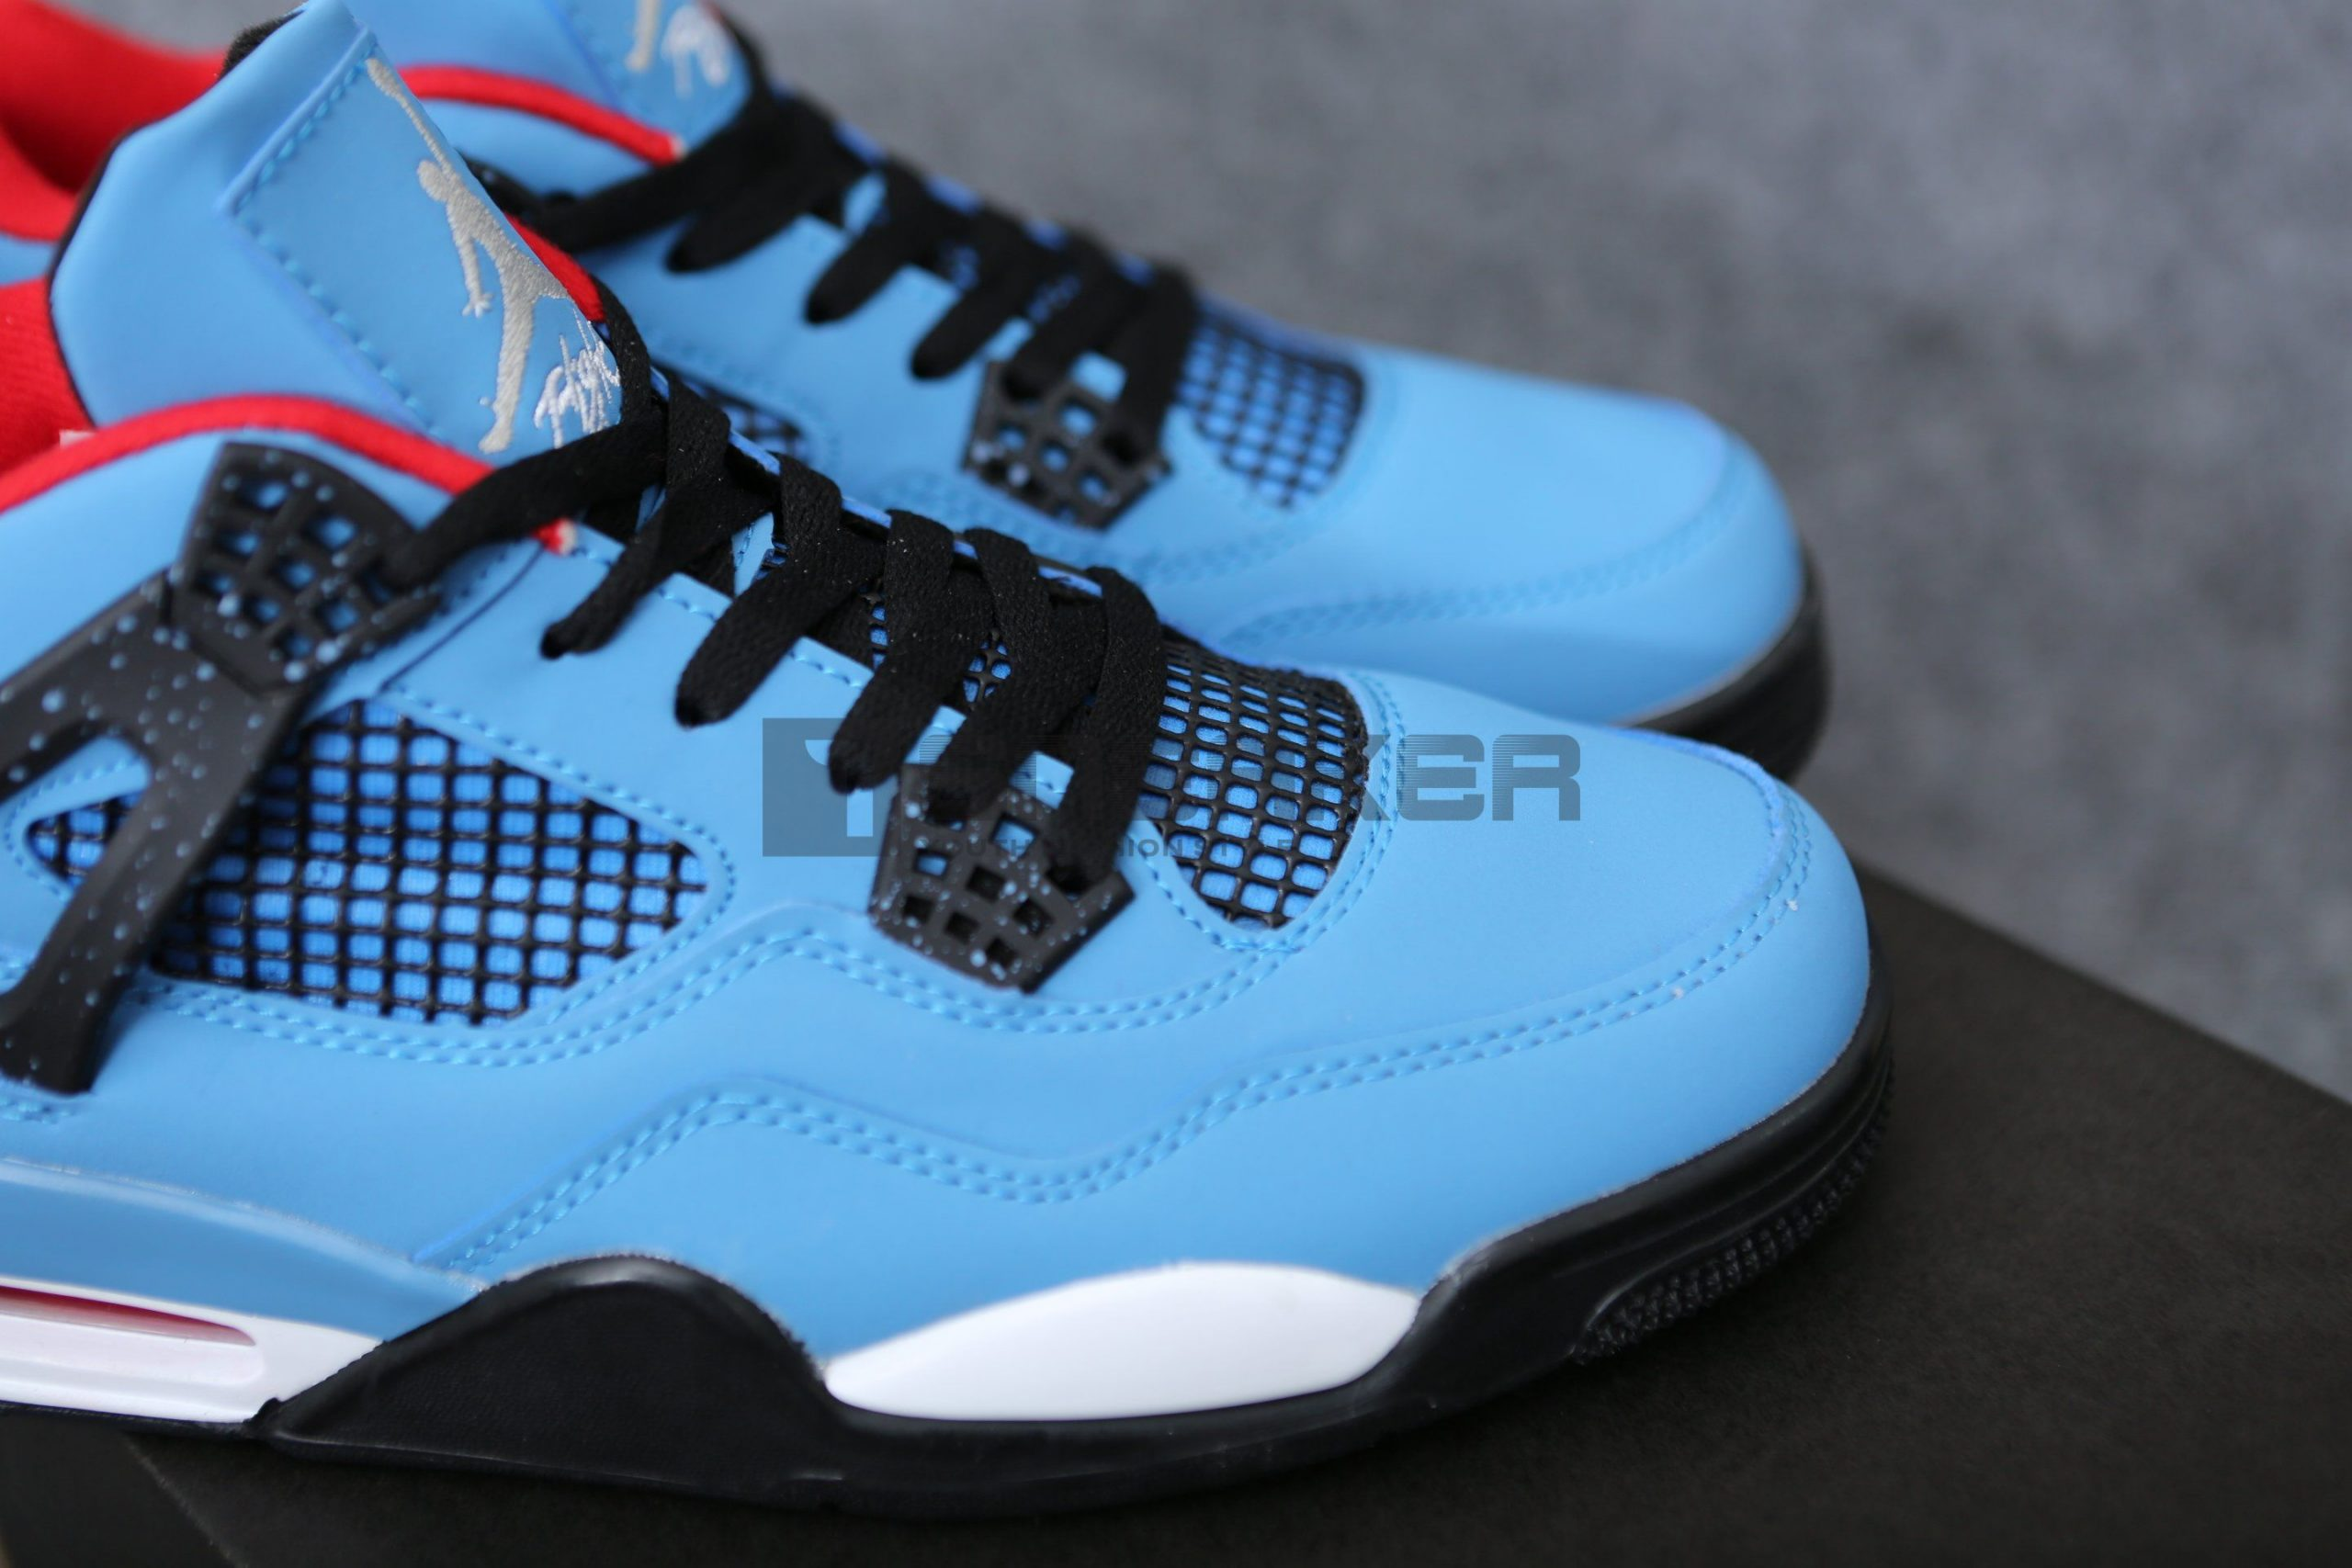 Giay Nike Air Jordan 4 Travis Scott Pk God Factory 7 scaled